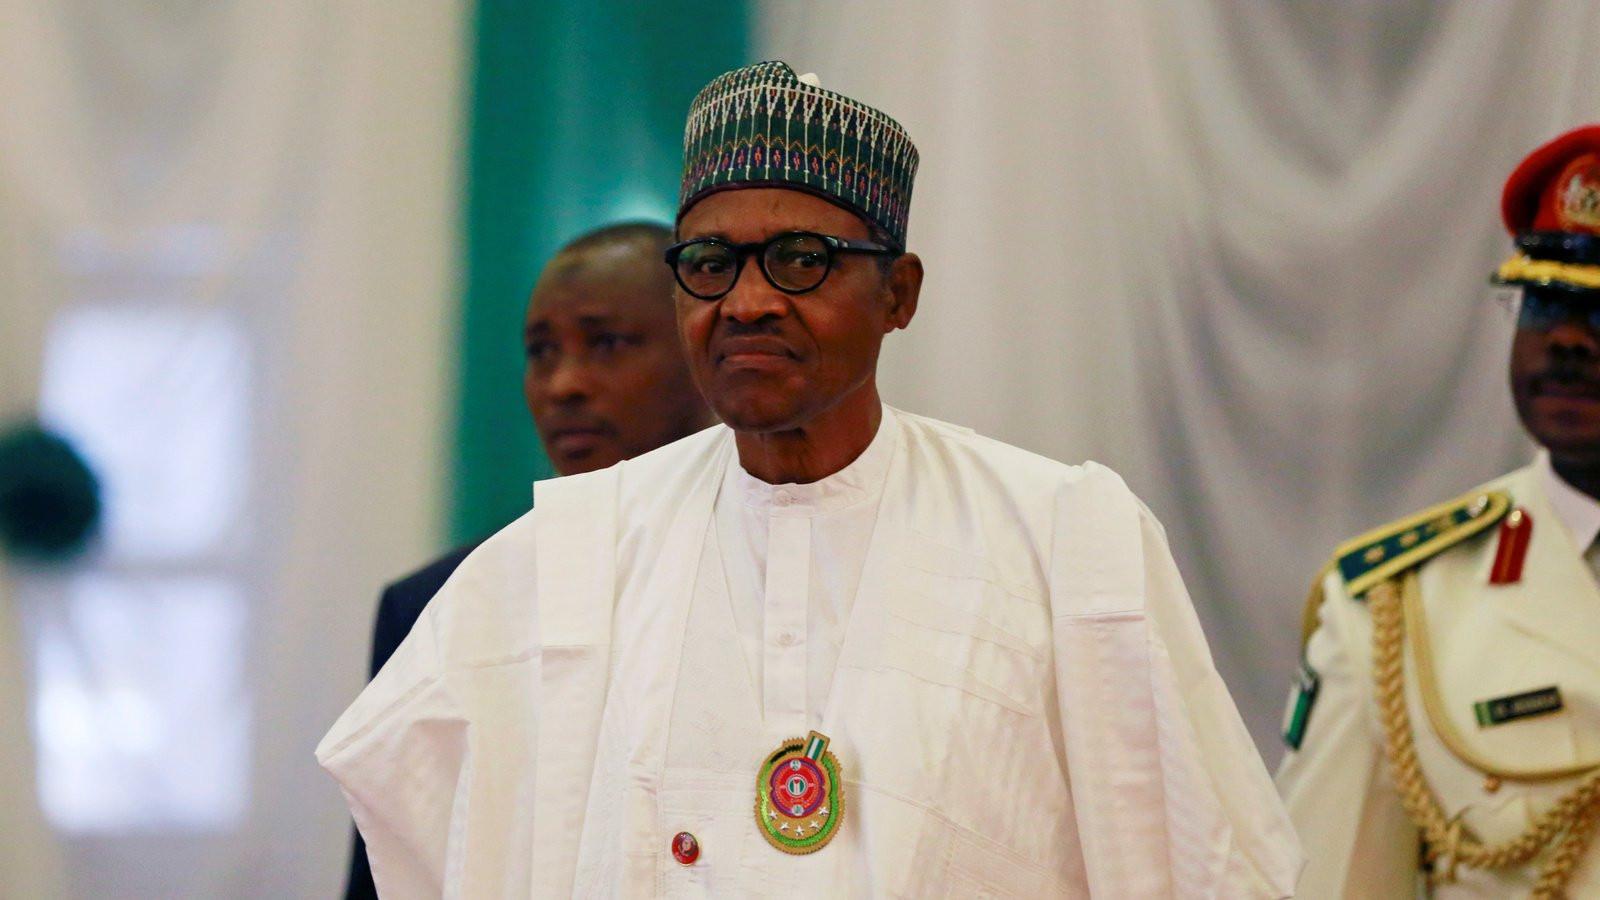 President Buhari to visit Lagos today Thursday, June 10